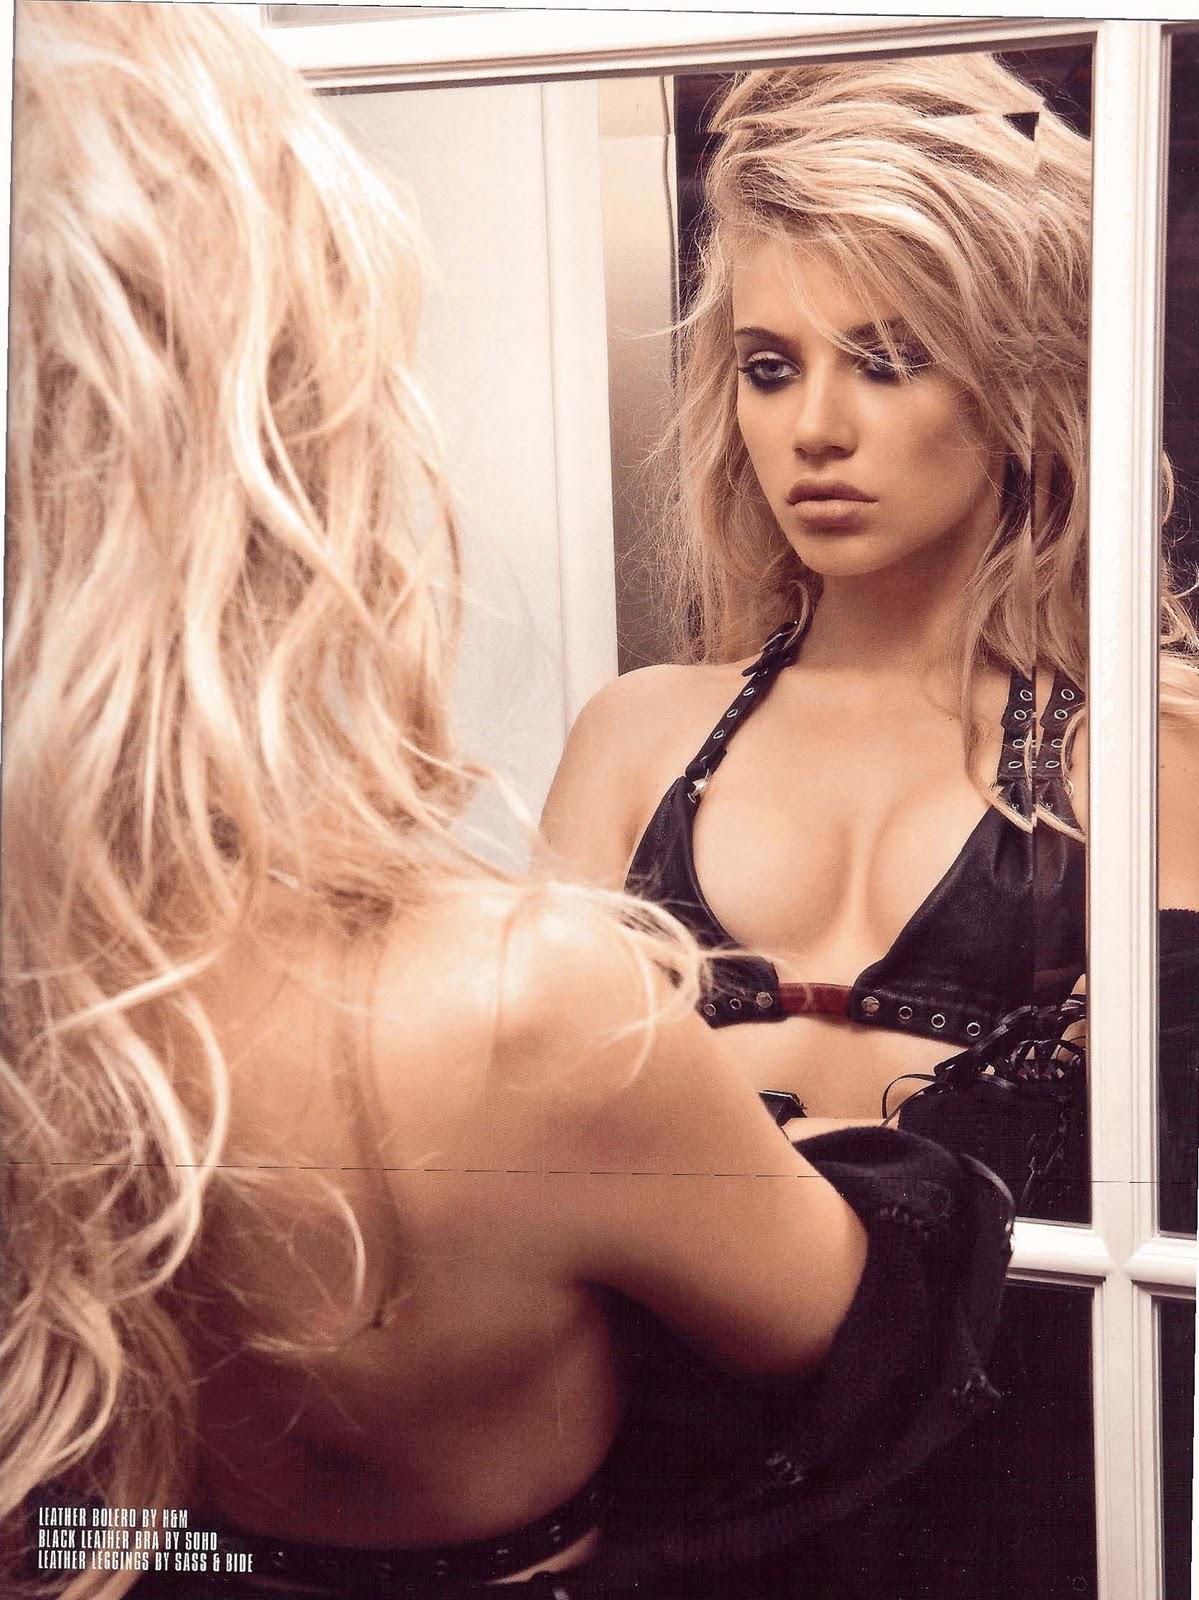 Watch Xenia Tchoumitcheva Nude Photos and Videos video